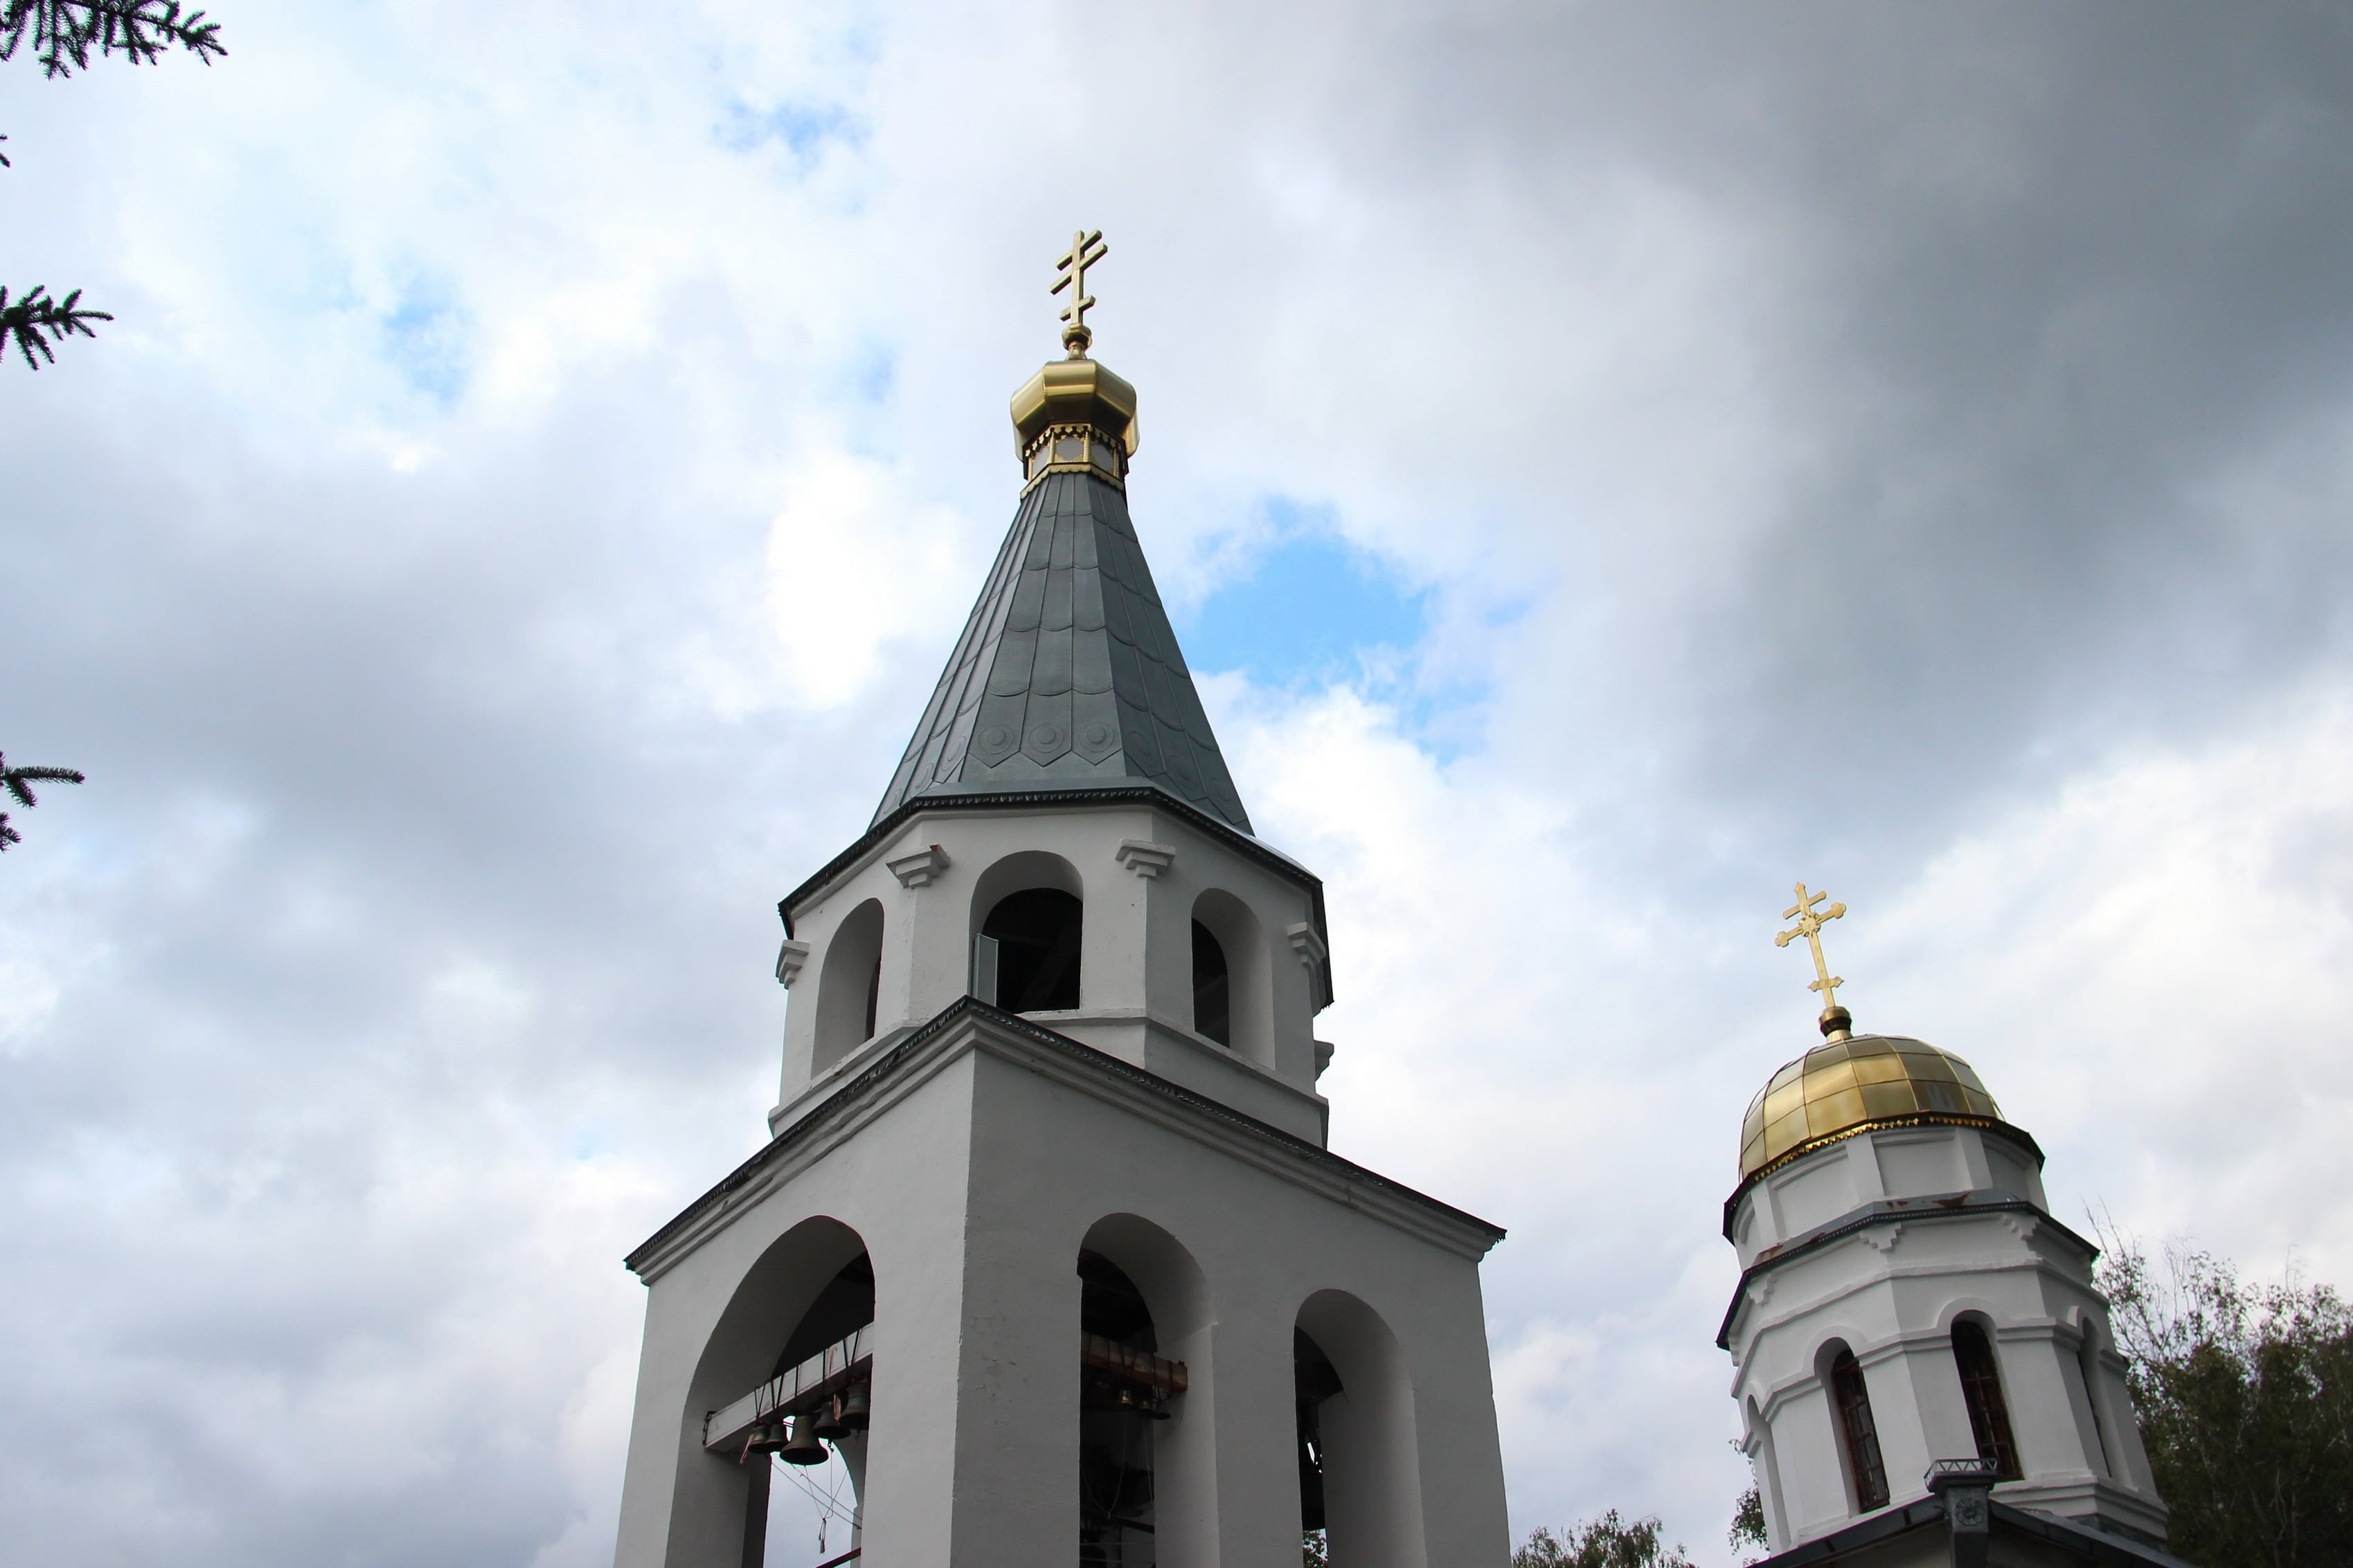 http://monuspen.ru/photoreports/bd07fe7c5c5d4535df583b2bc866639c.JPG